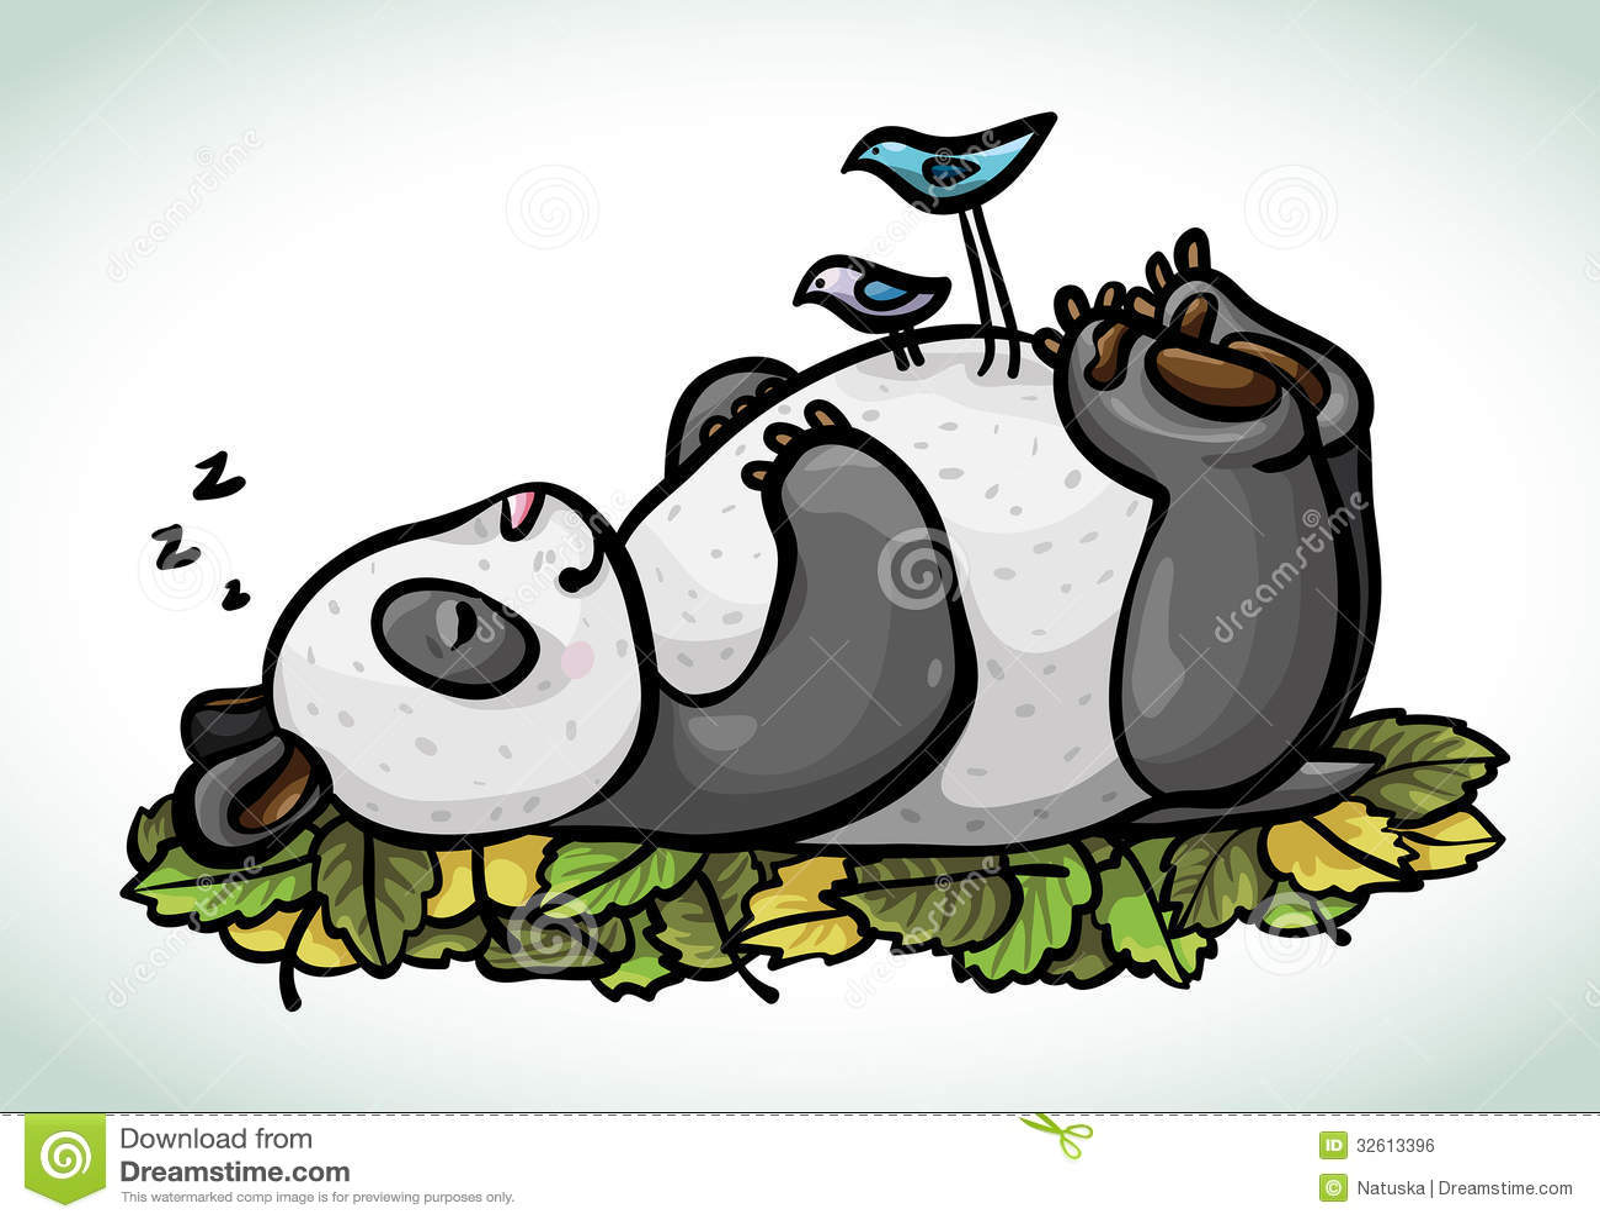 Cartoon Sleeping Panda And Birds Royalty Free Stock Image